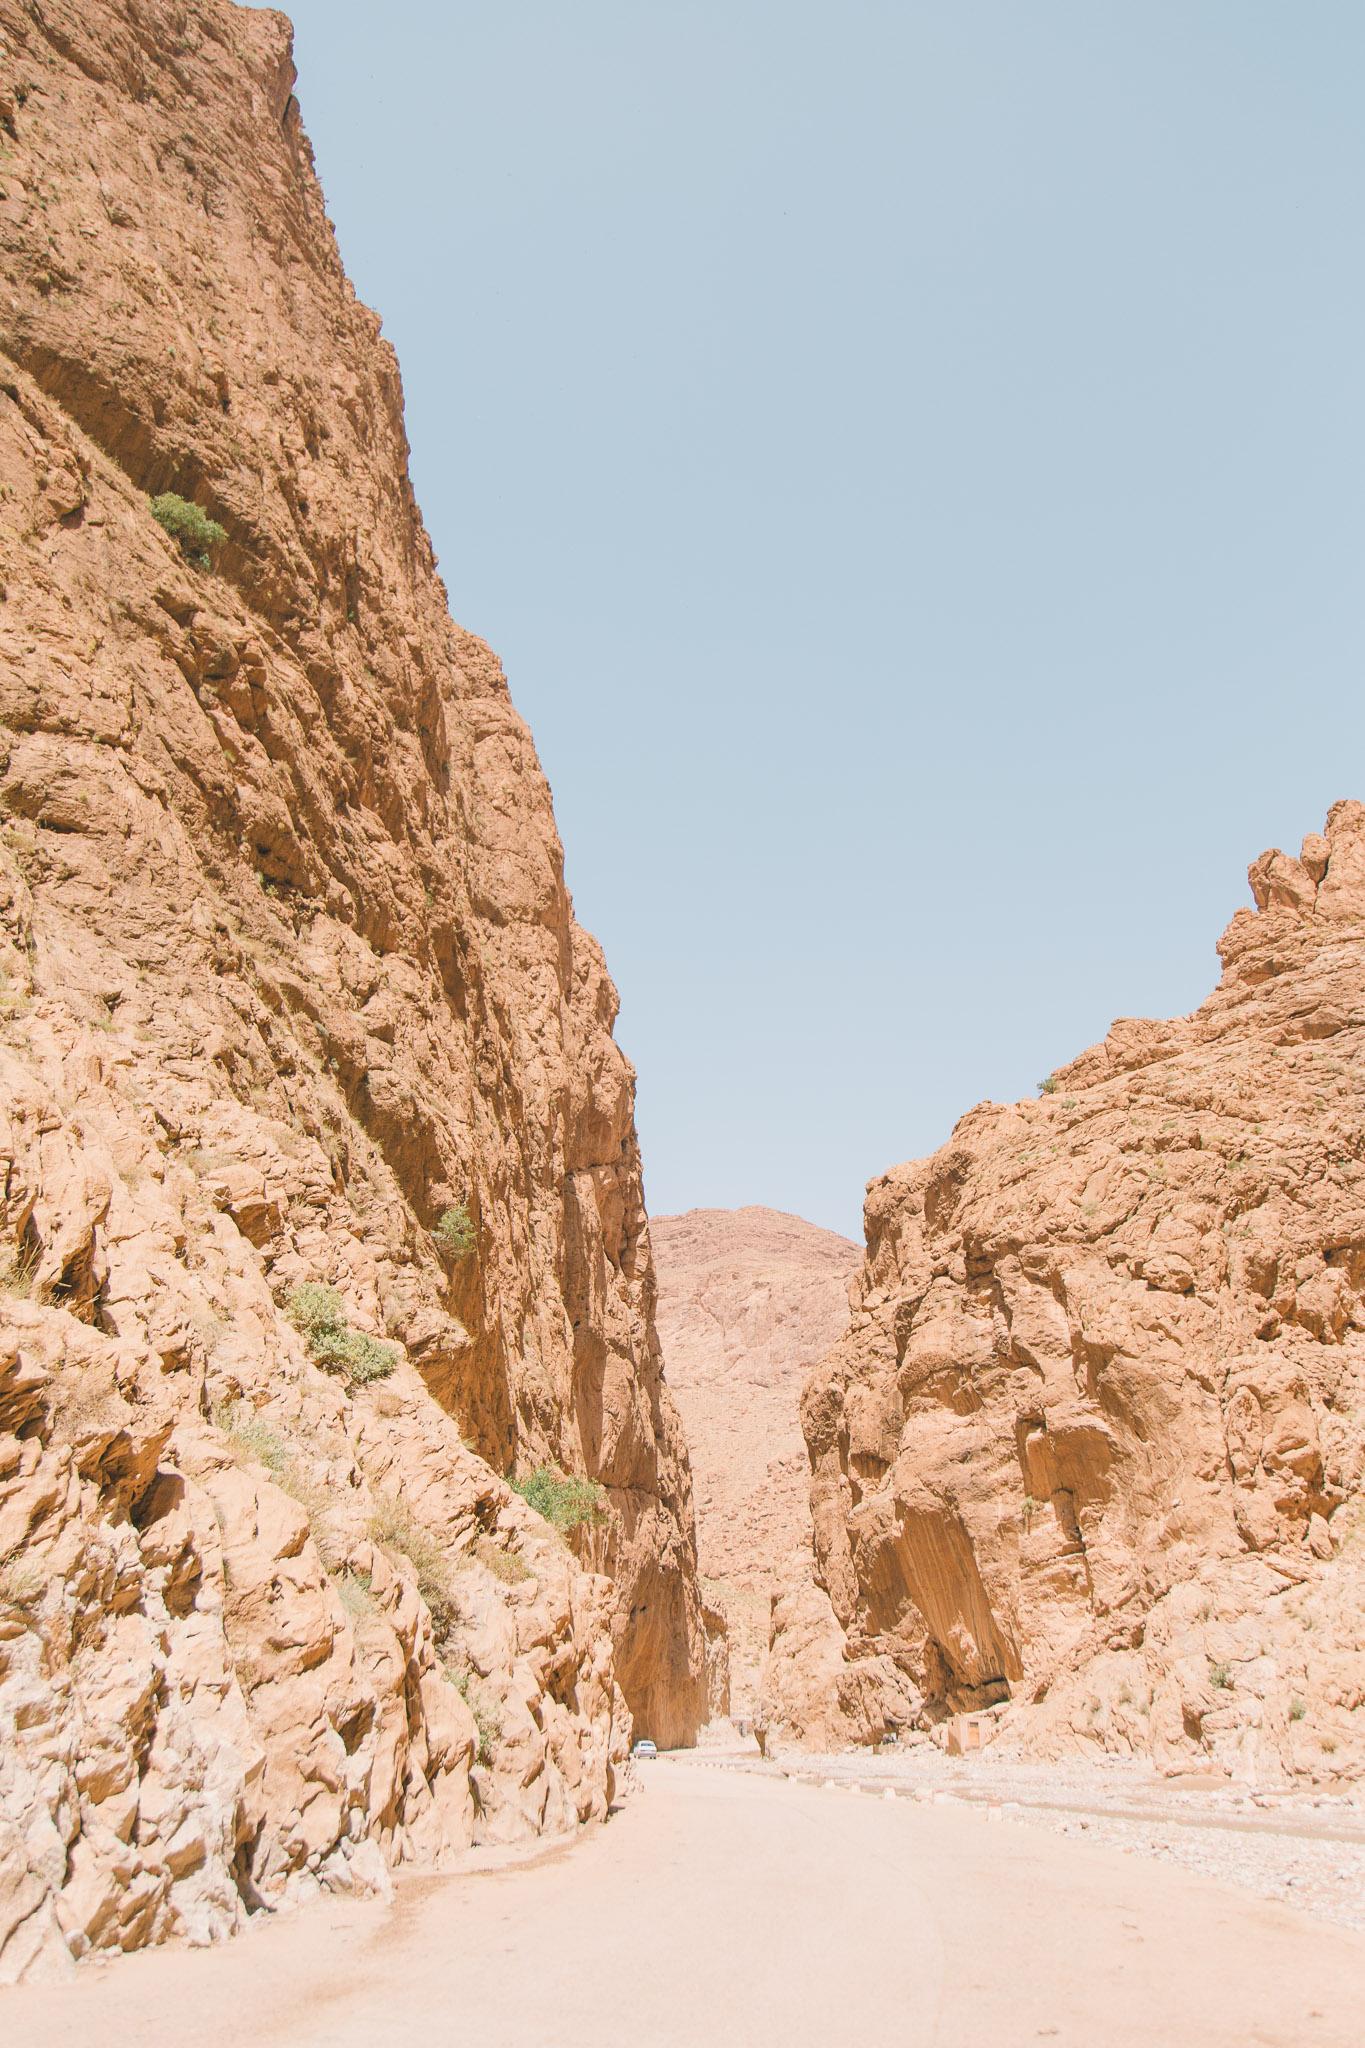 morocco-todra-todgha-gorge-2.jpg